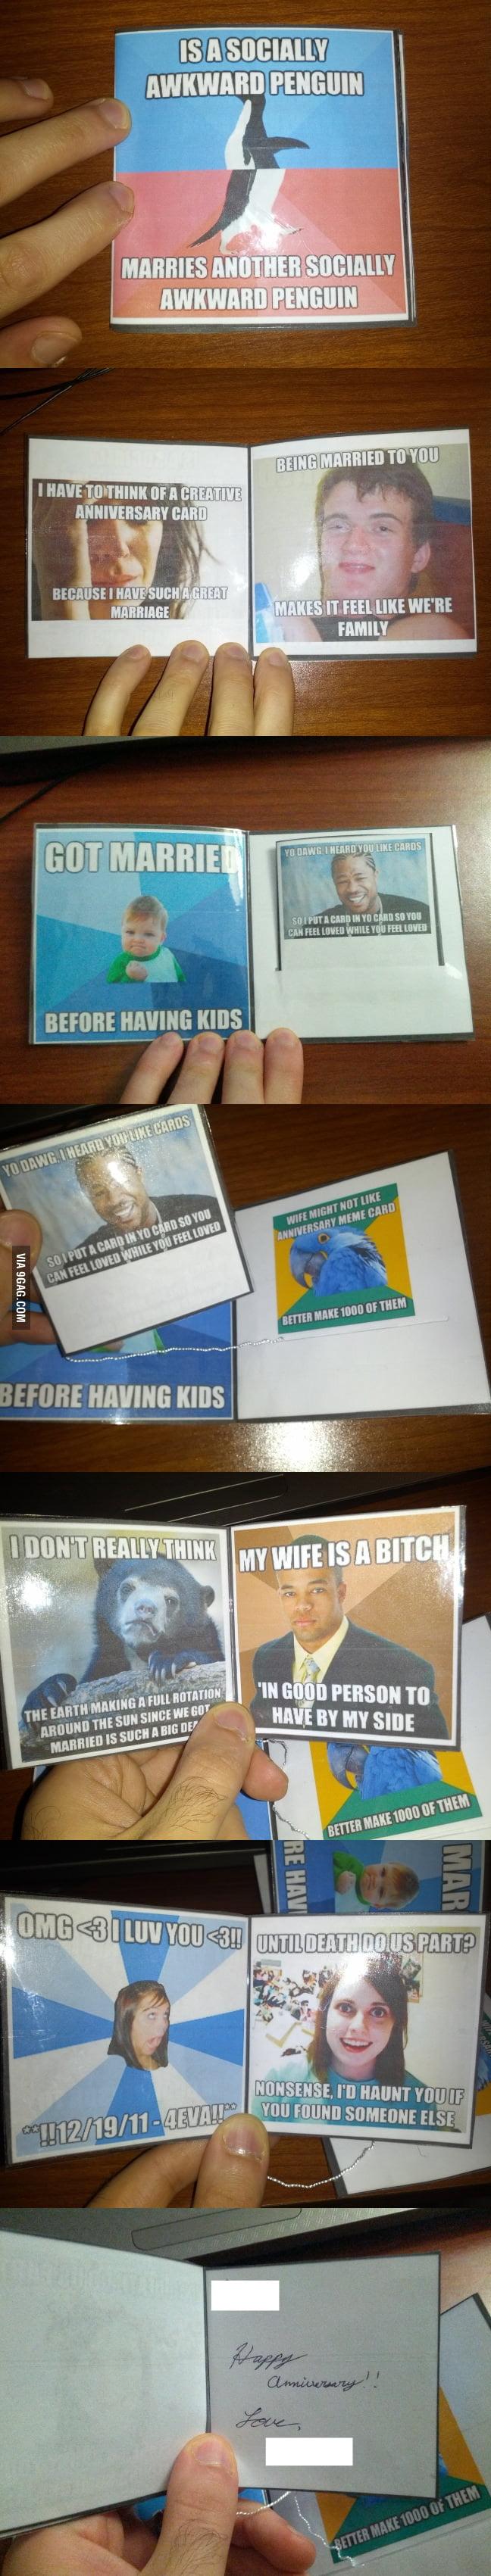 Amazing wedding anniversary cards using memes.